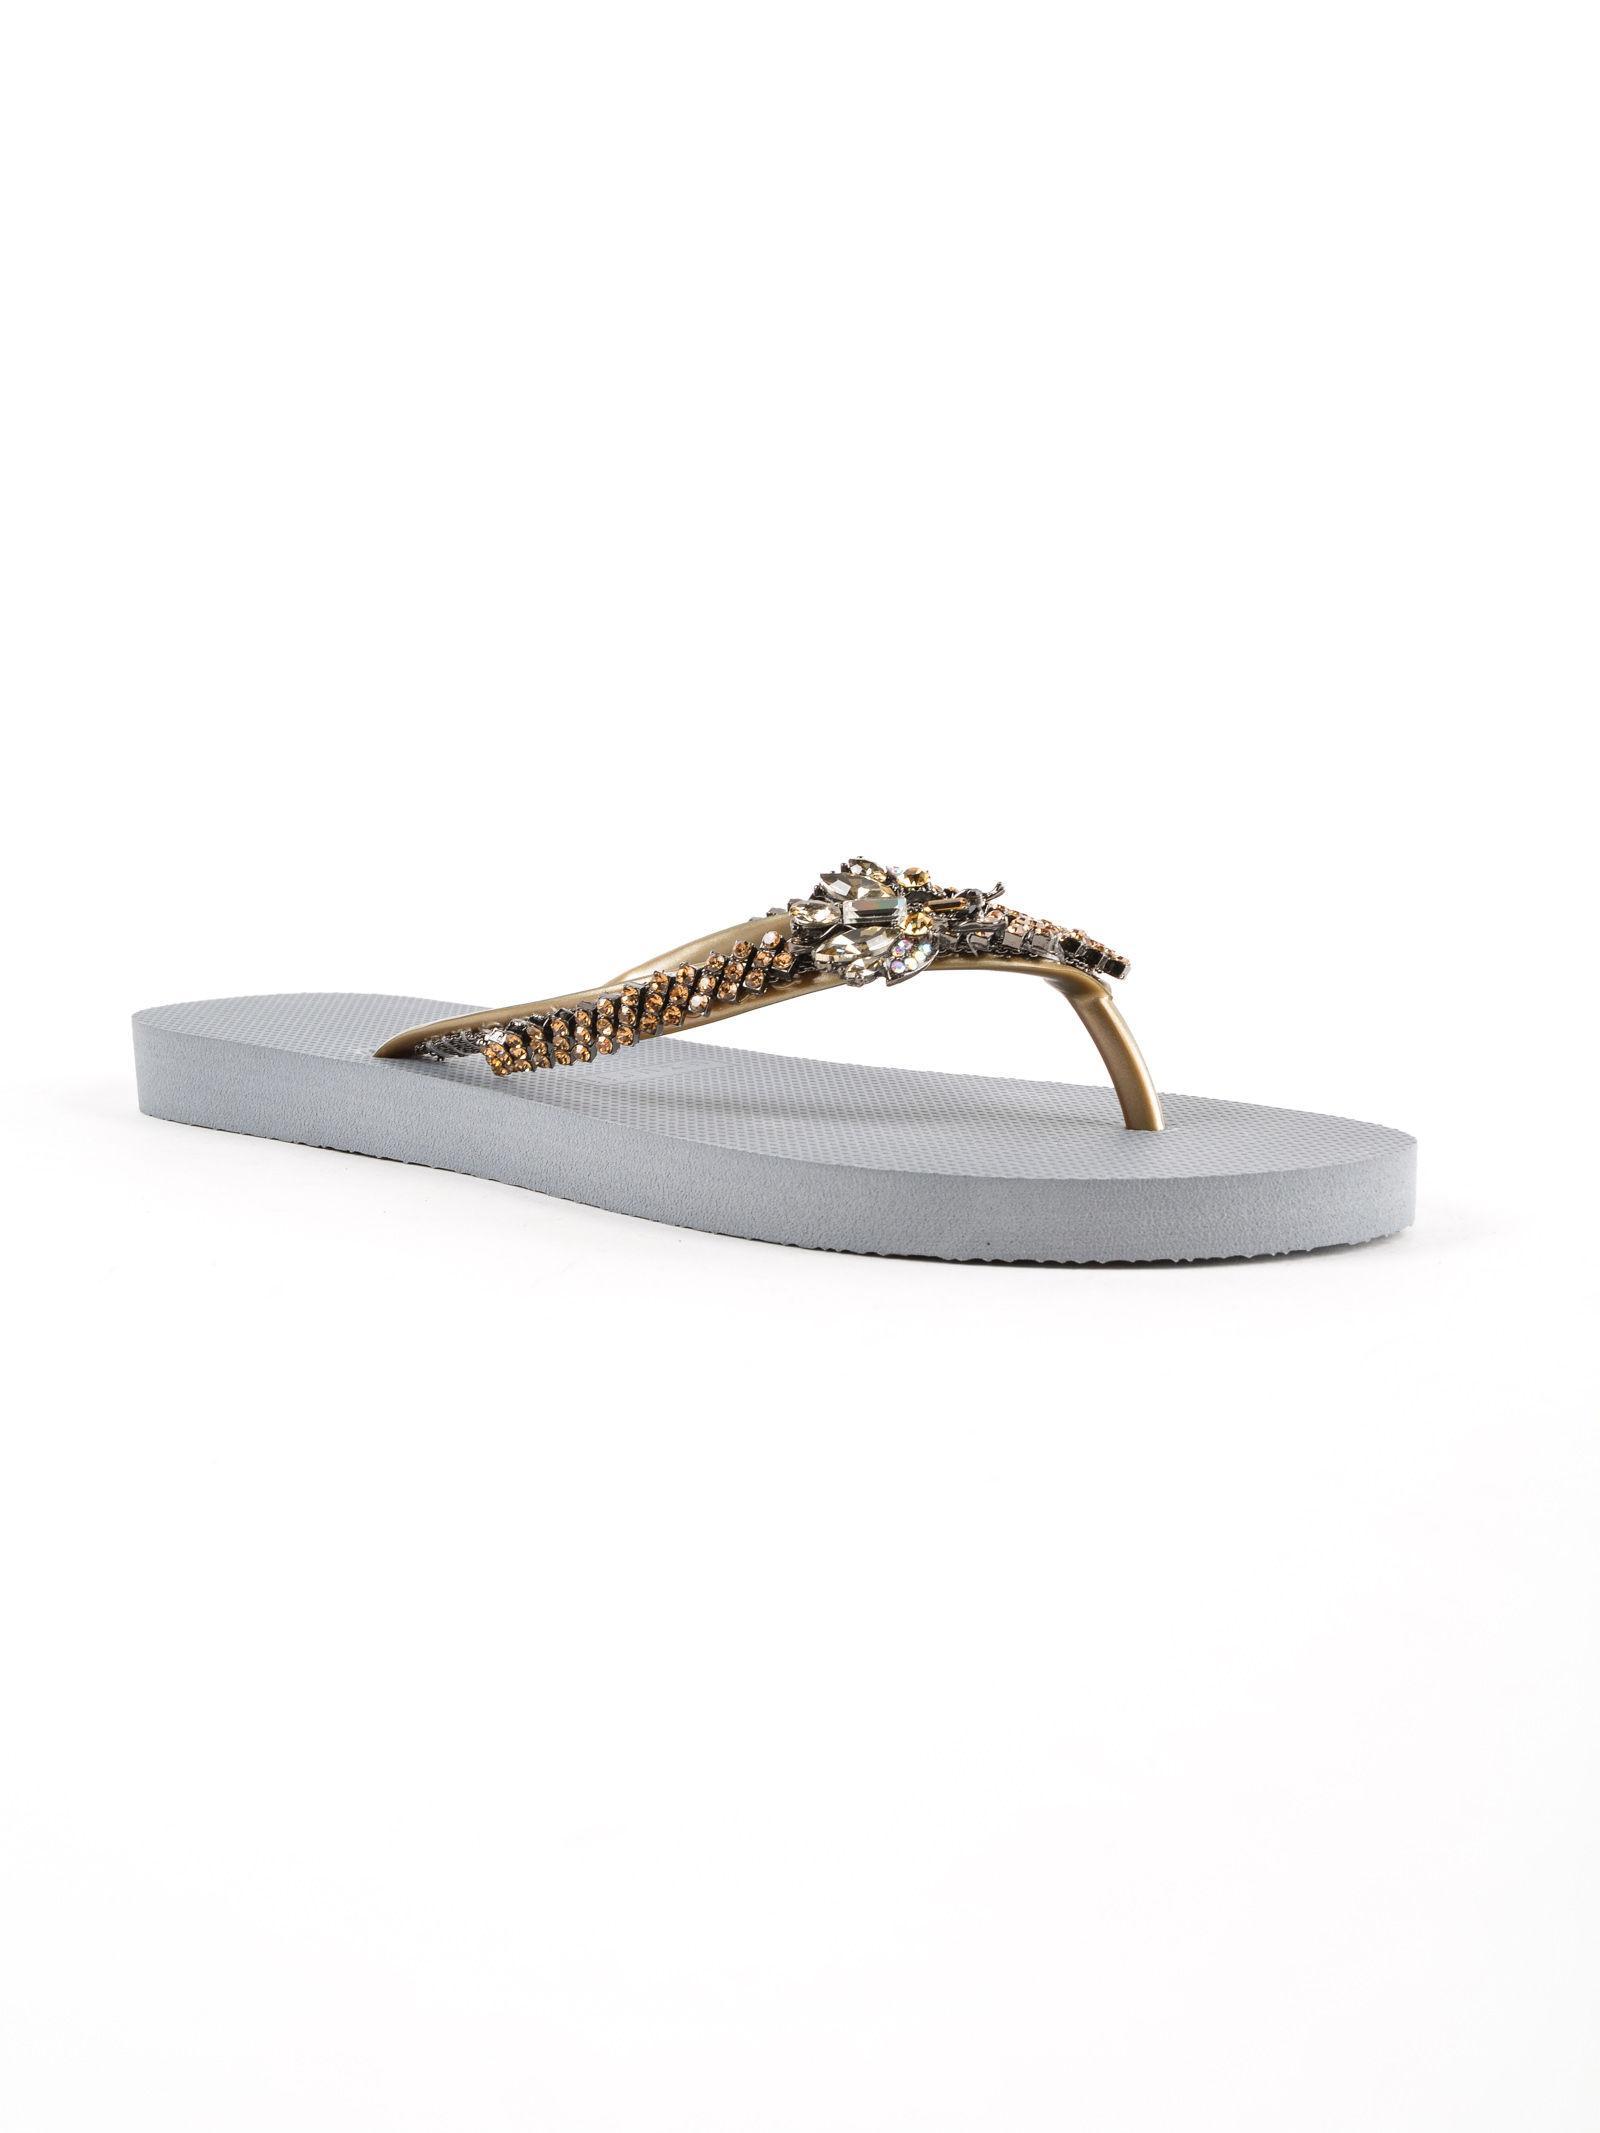 57a9d2c9316 Uzurii Flip Flops Gold Fly in Metallic - Save 1% - Lyst